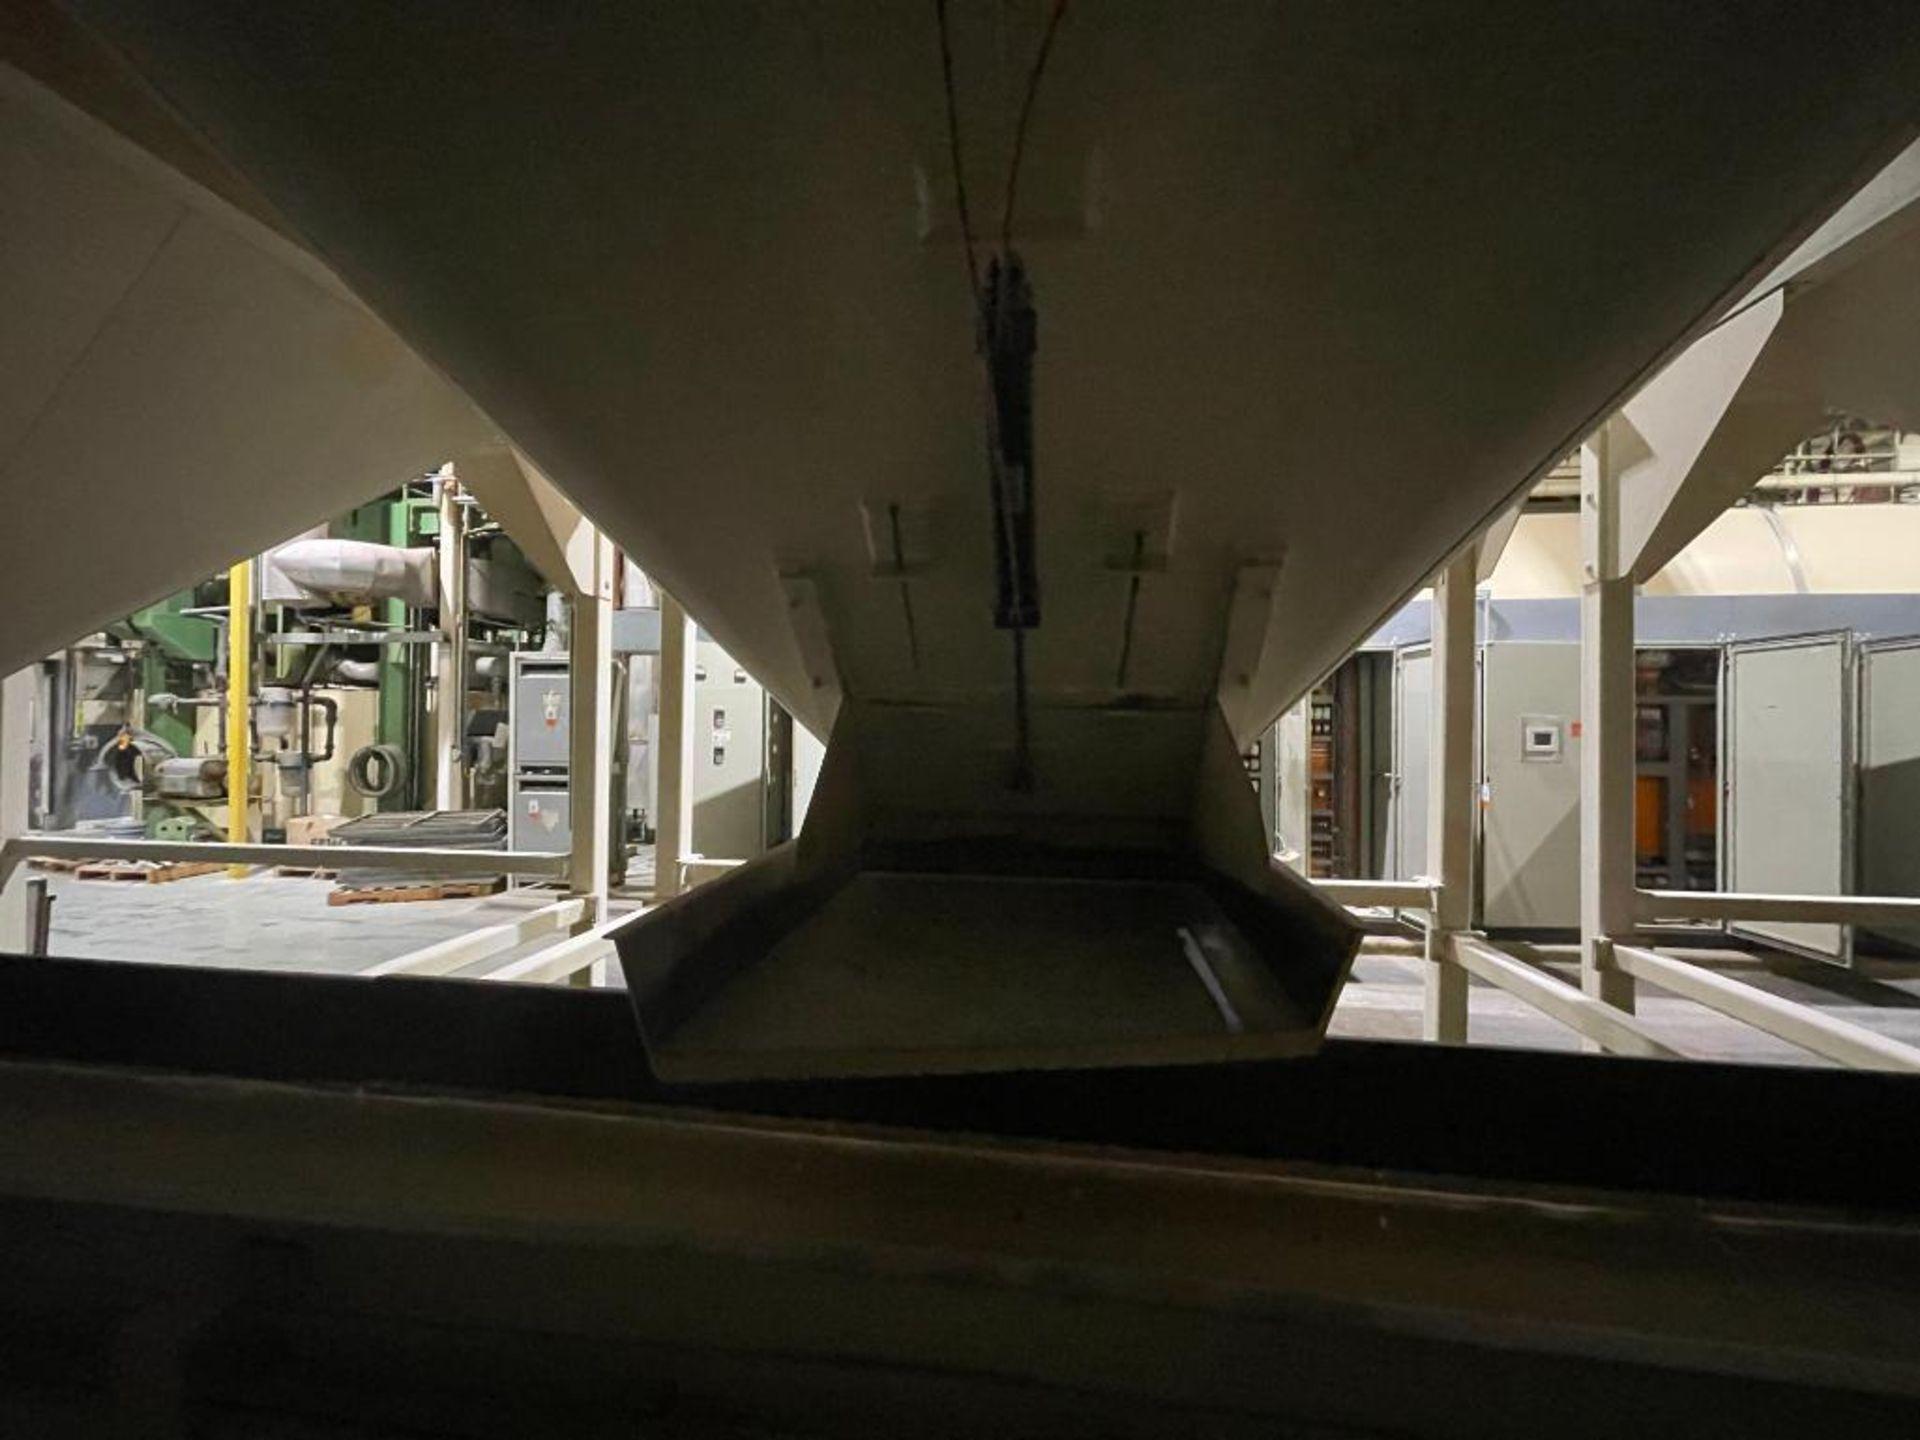 Aseeco mild steel cone bottom bulk storage bin - Image 15 of 28